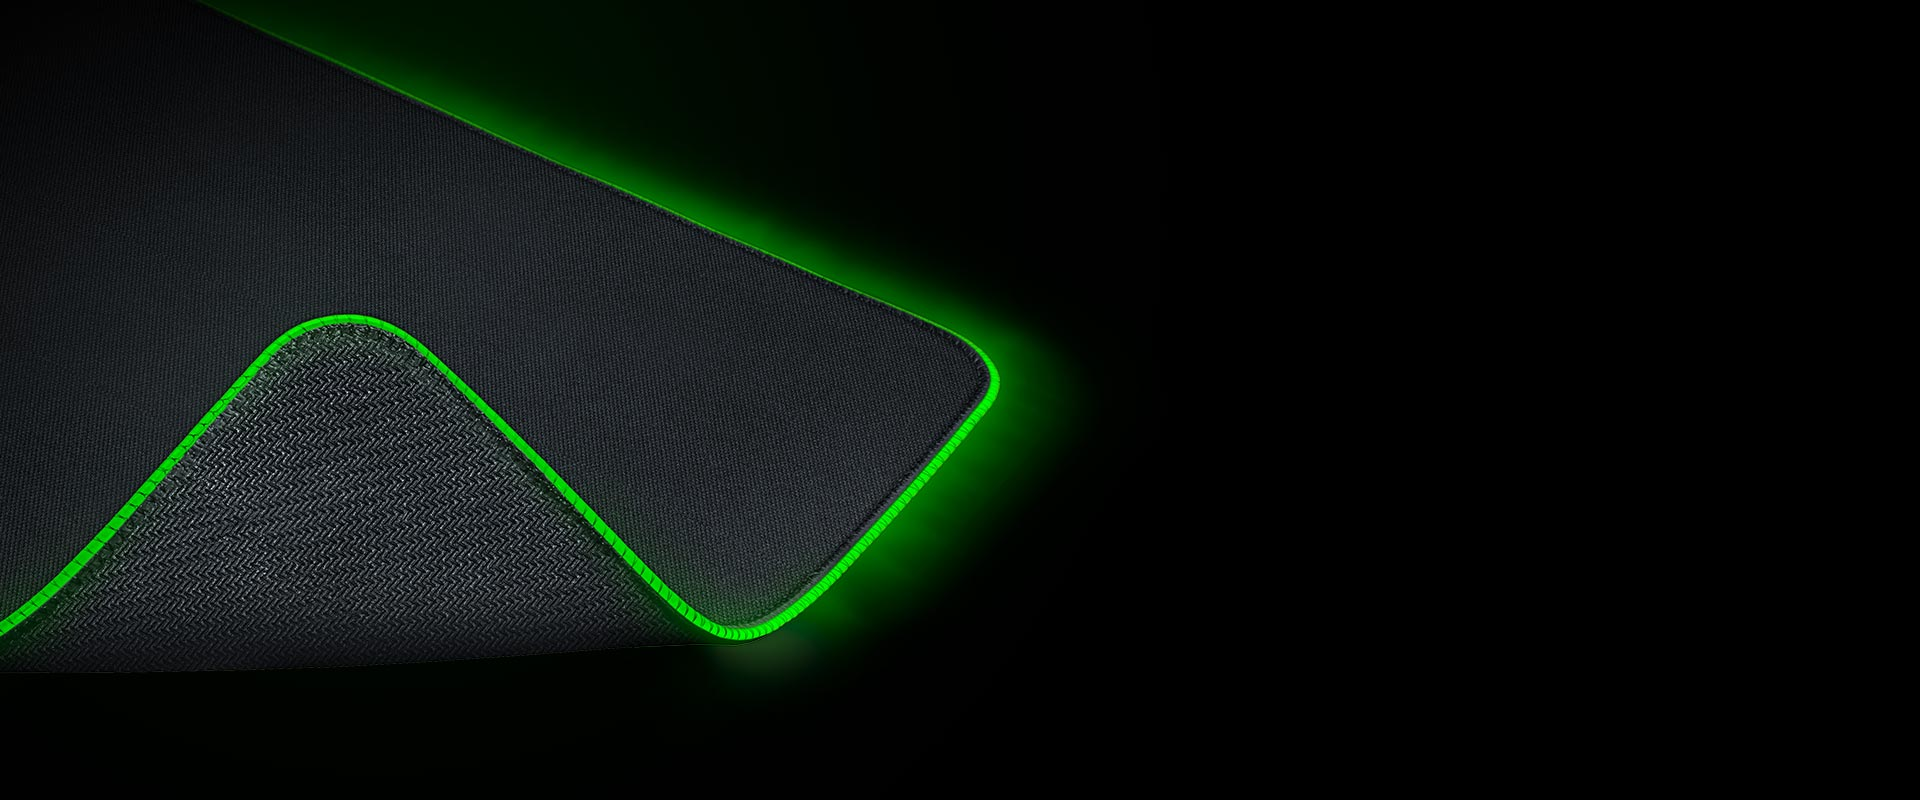 https://assets2.razerzone.com/images/pnx.assets/c9d3f46da252e9a4df43f3a8bad737ea/razer-goliathus-chroma-desktop-micro-textured-cloth-surface.jpg